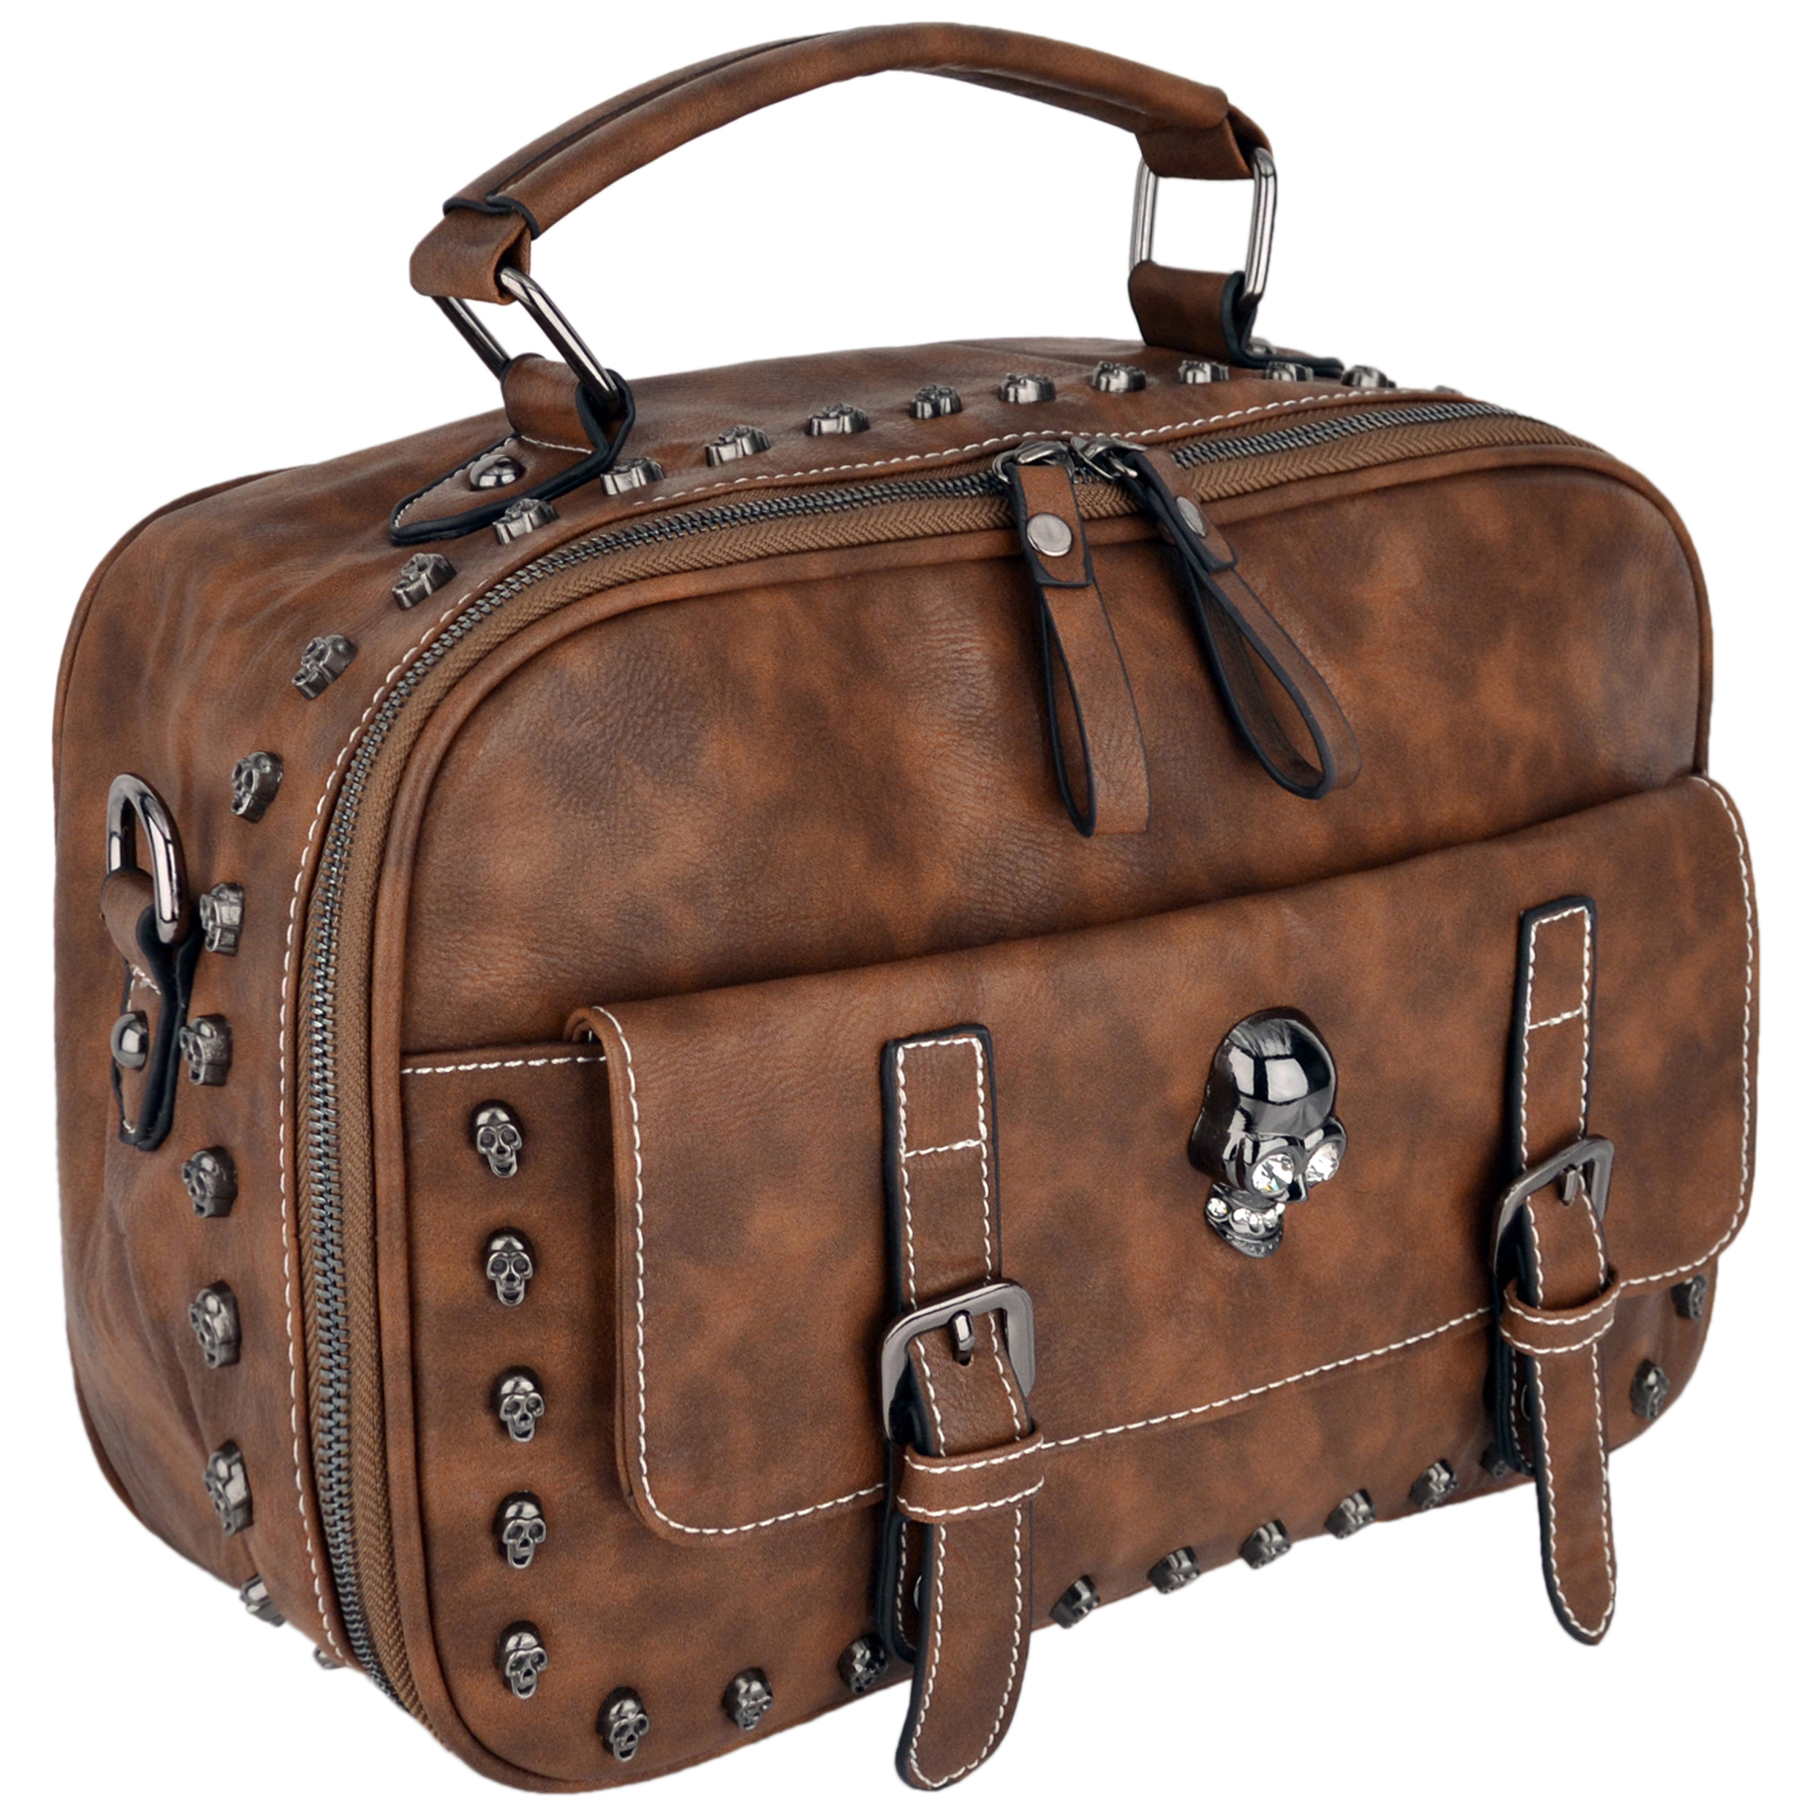 Women's Designer Handbag MASON in Brown Gothic Style Satchel main image